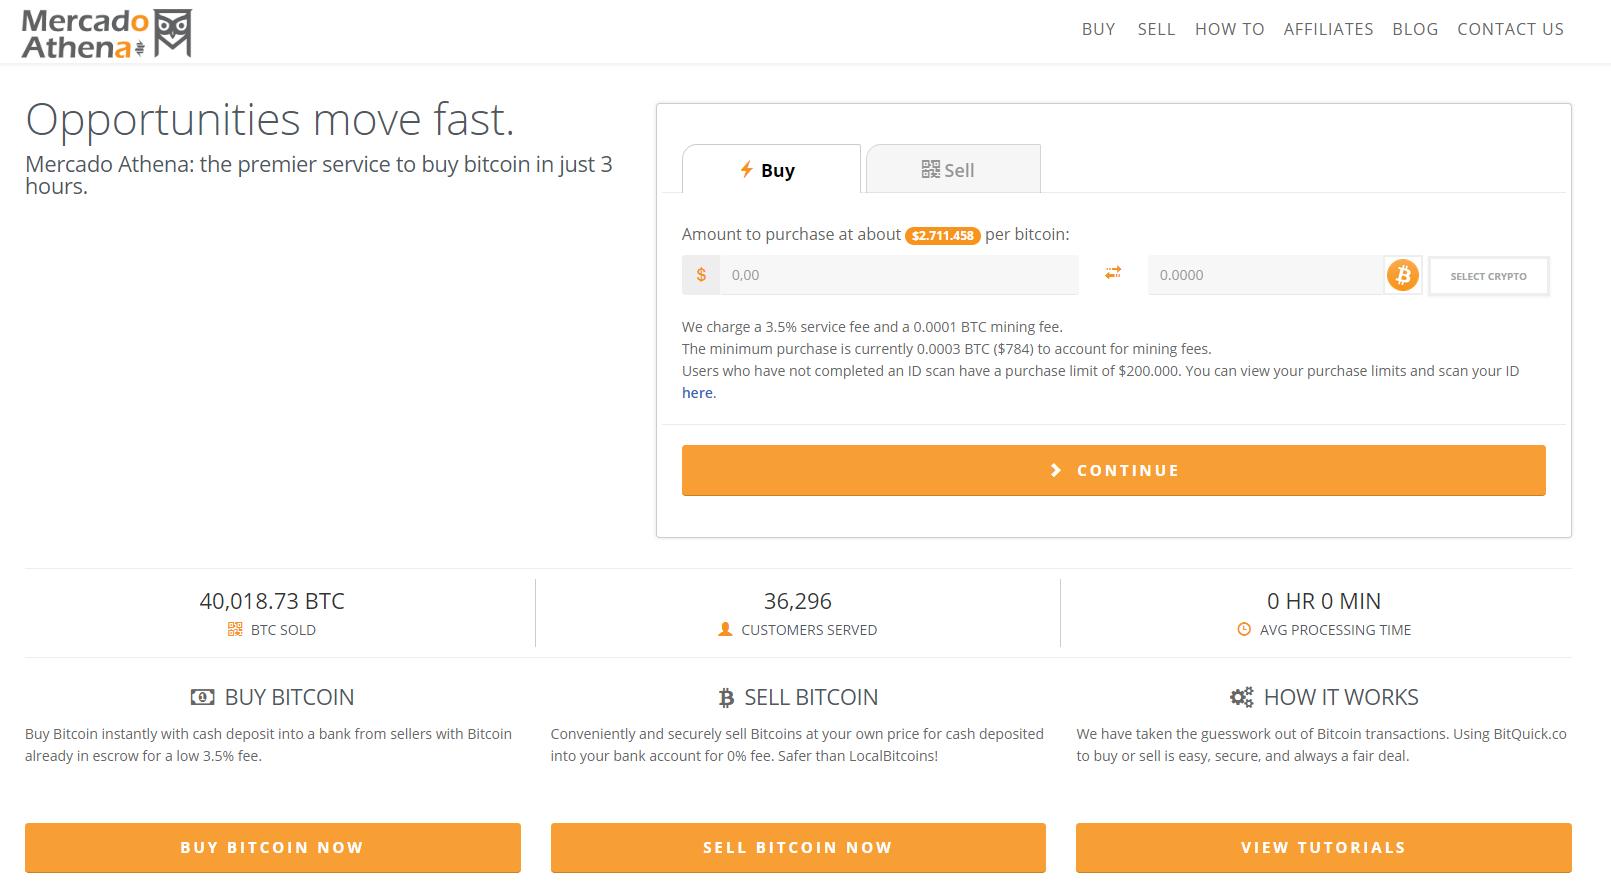 Mercado Athena Purchase Interface